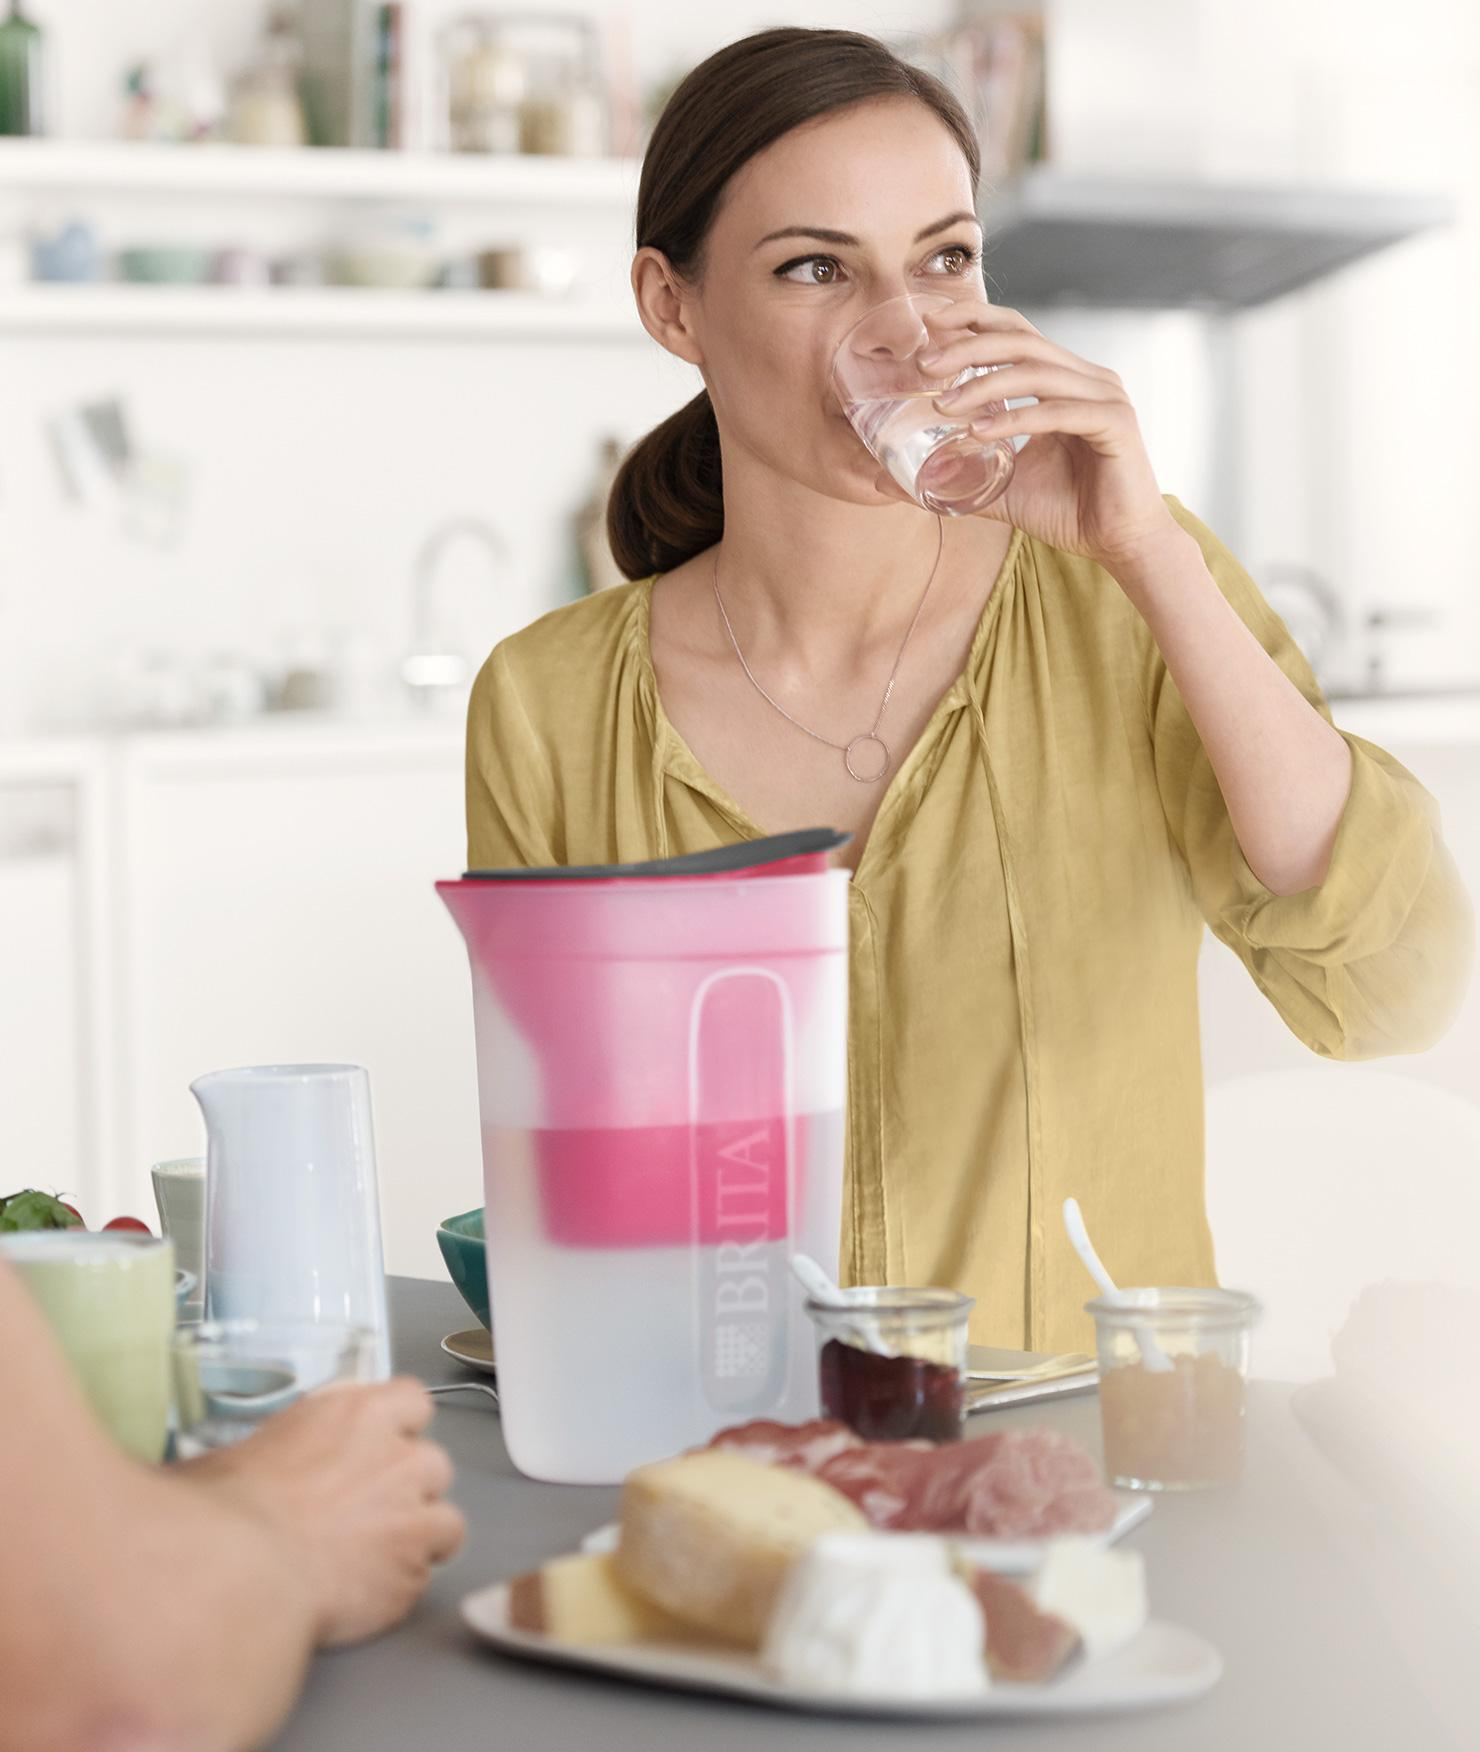 BRITA fill&enjoy Fun pink kitchen woman drink